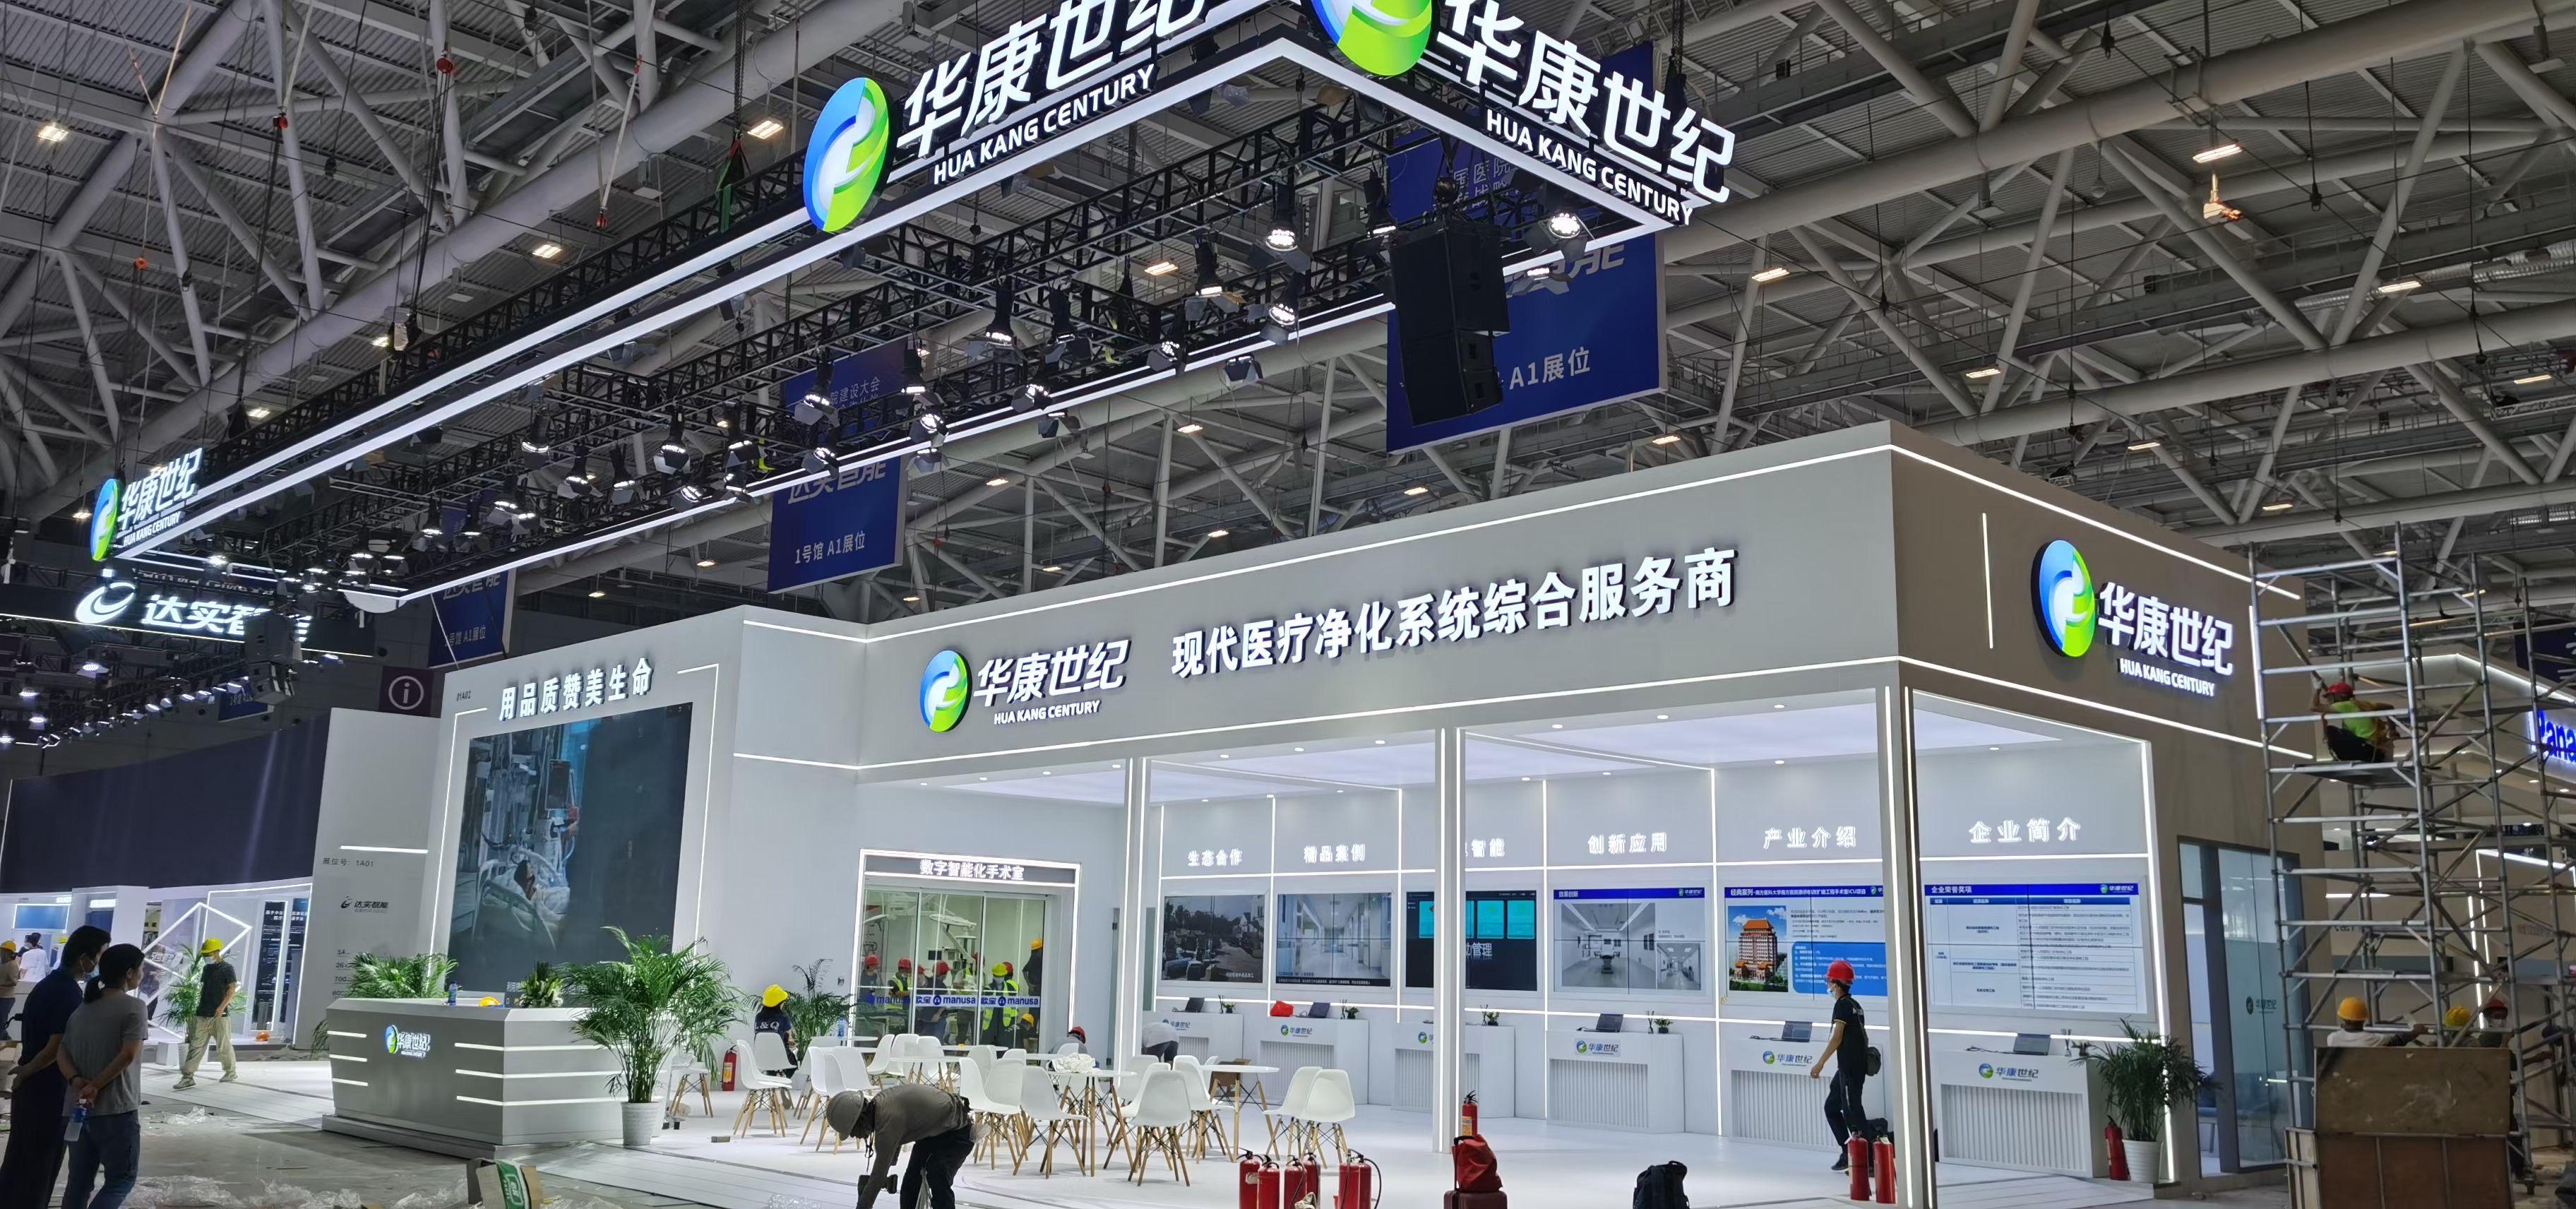 CHCC 2021 Shenzhen – Huakang Century